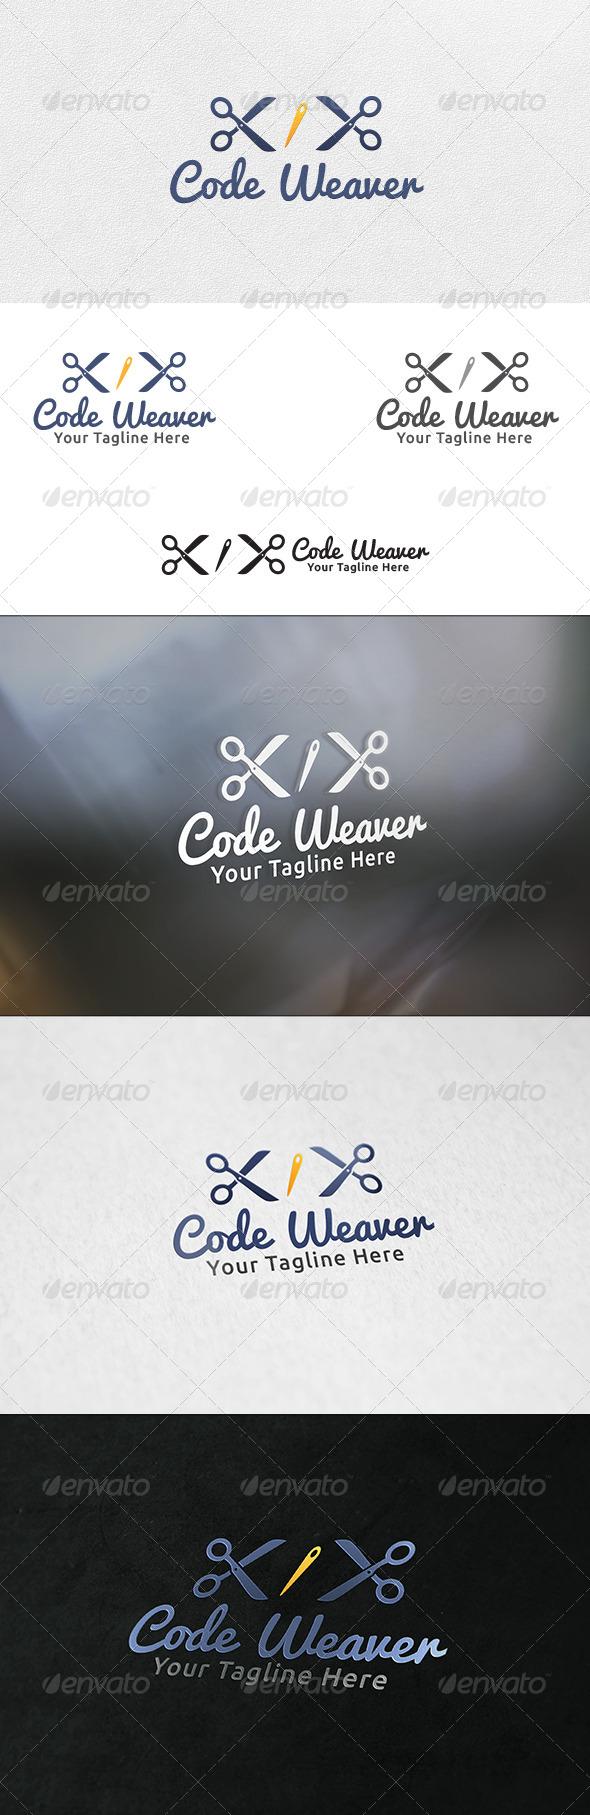 Code Weaver - Logo Template - Symbols Logo Templates